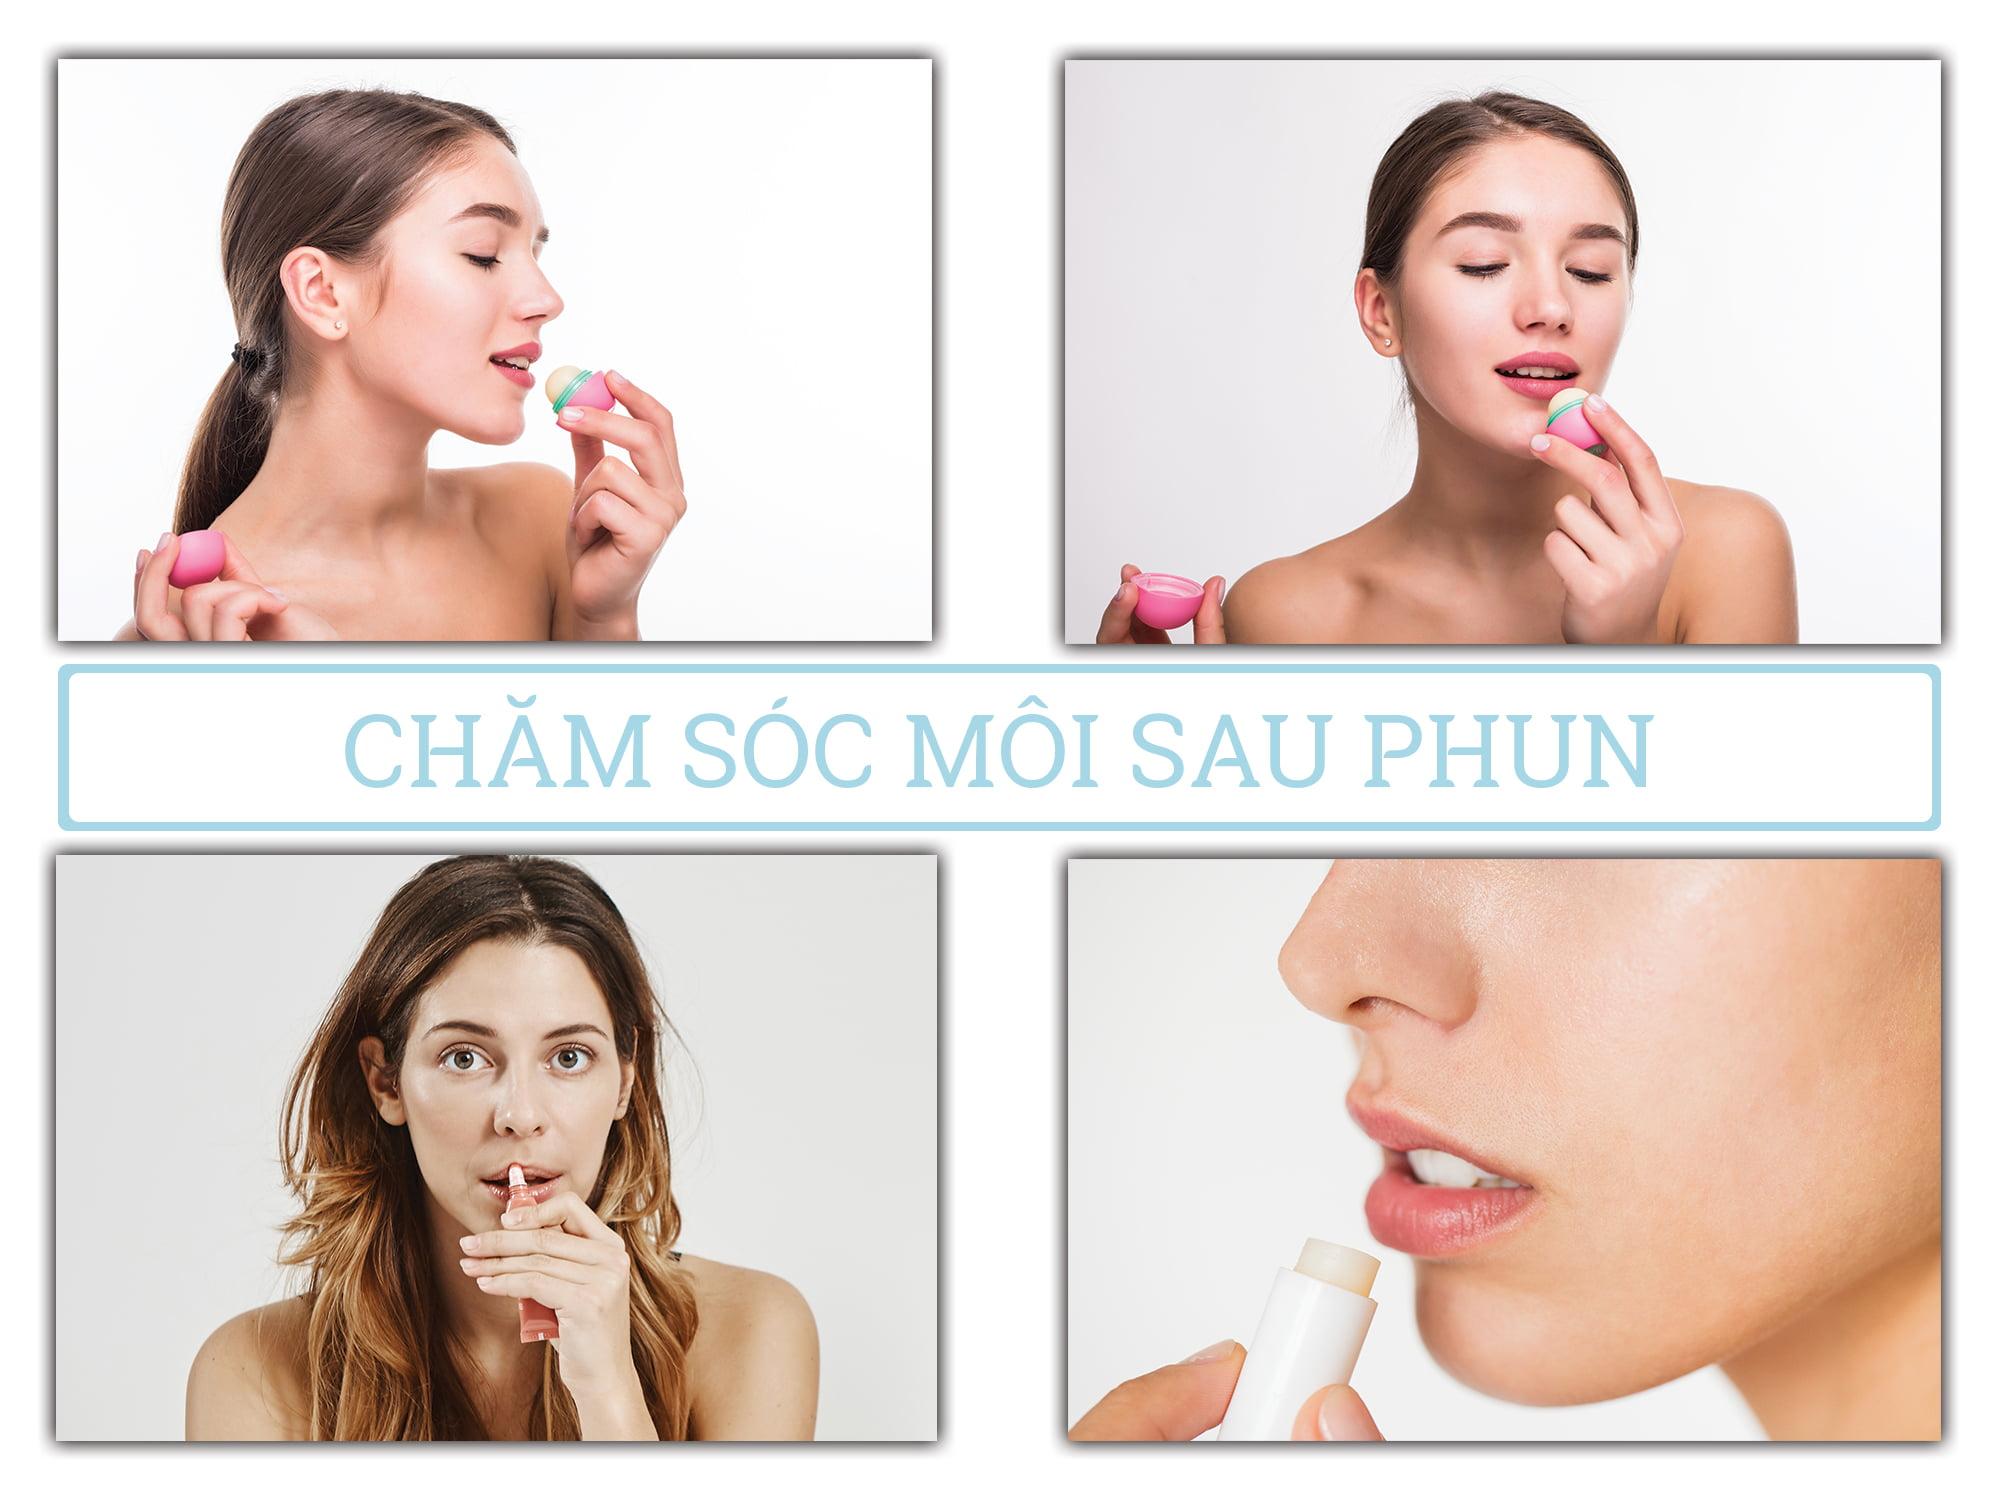 Chăm sóc môi sau phun